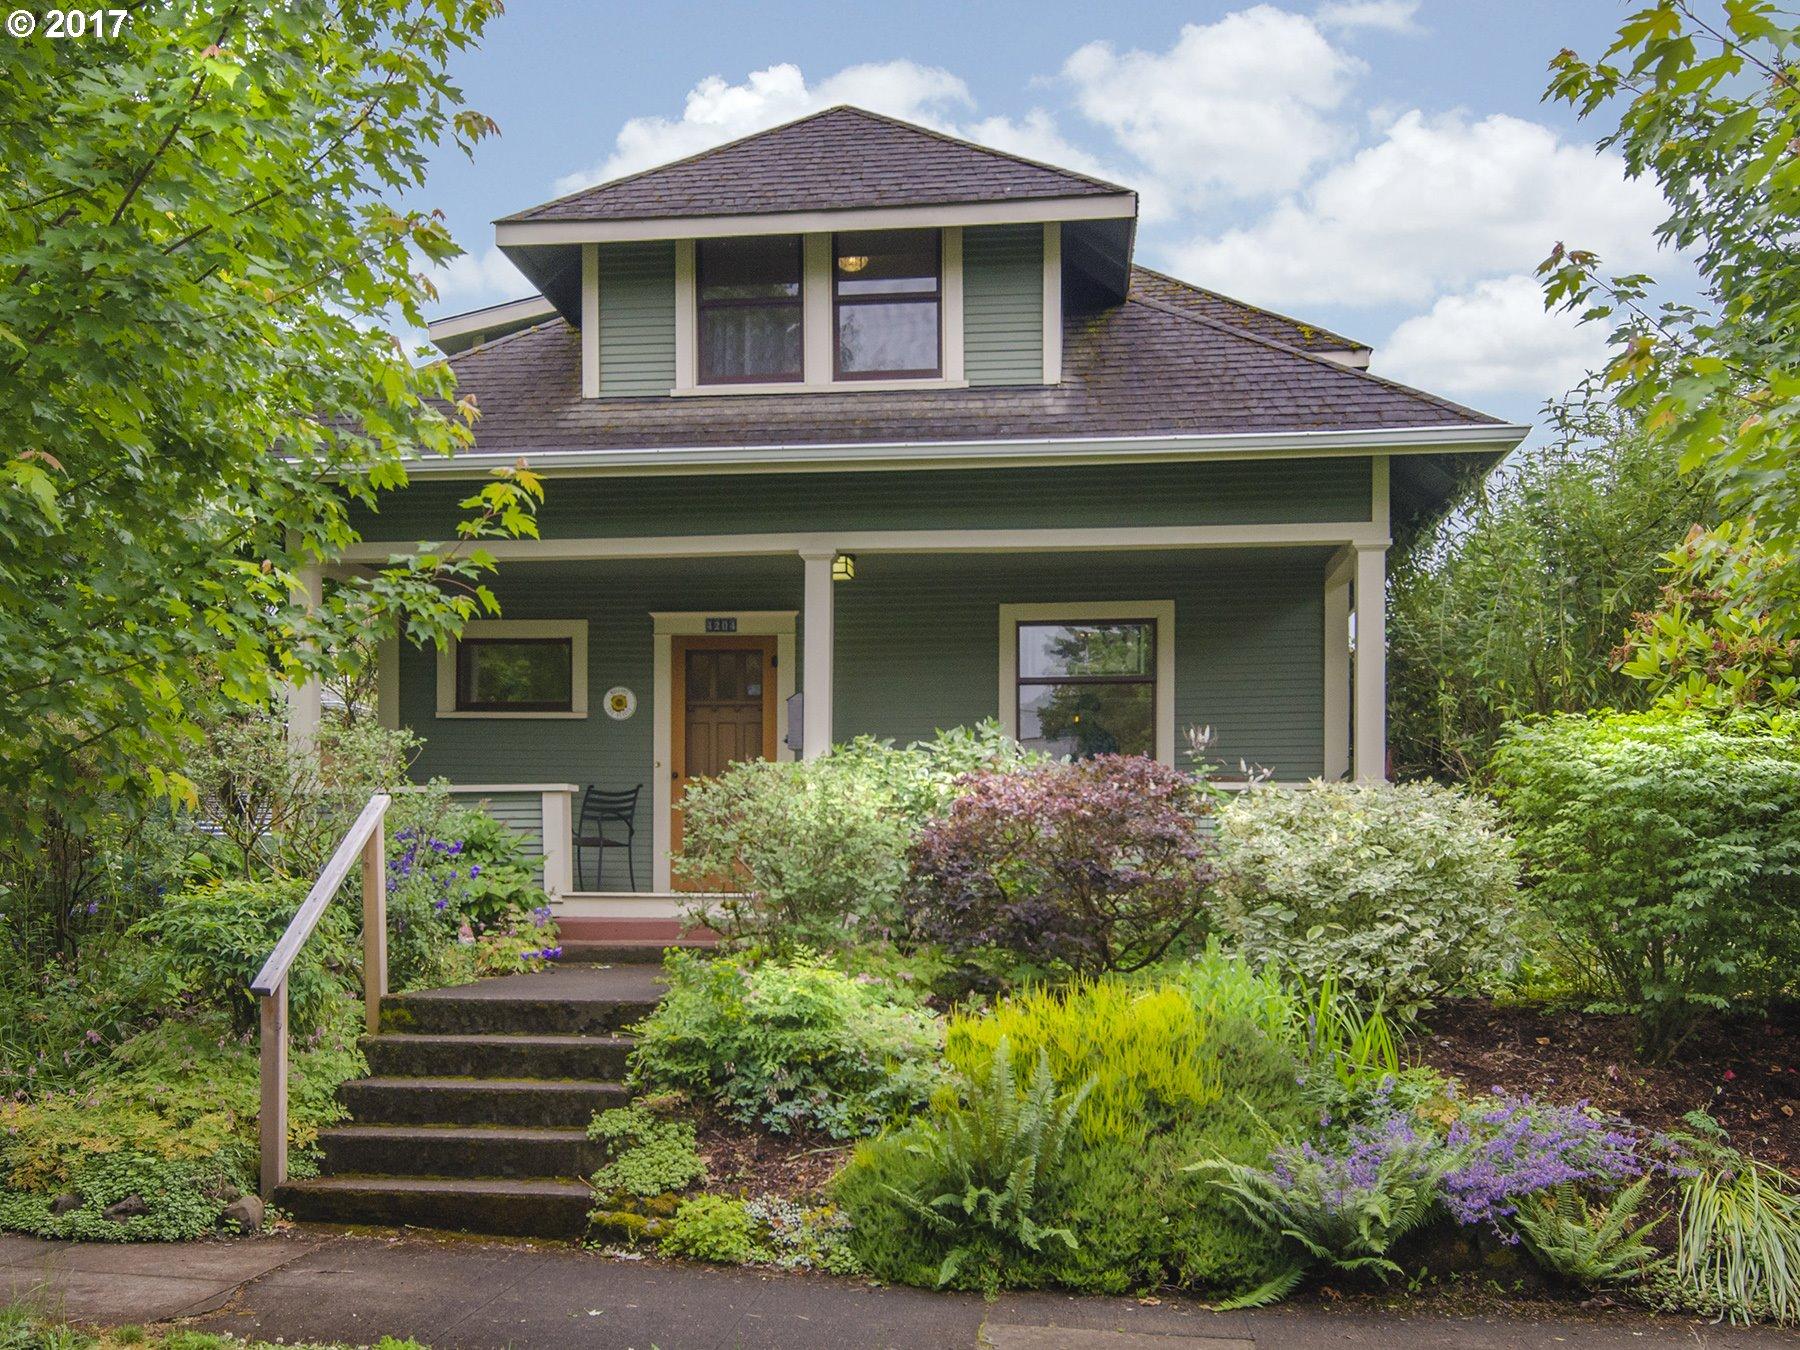 4204 SE MITCHELL ST Portland, OR 97206 - MLS #: 17581227